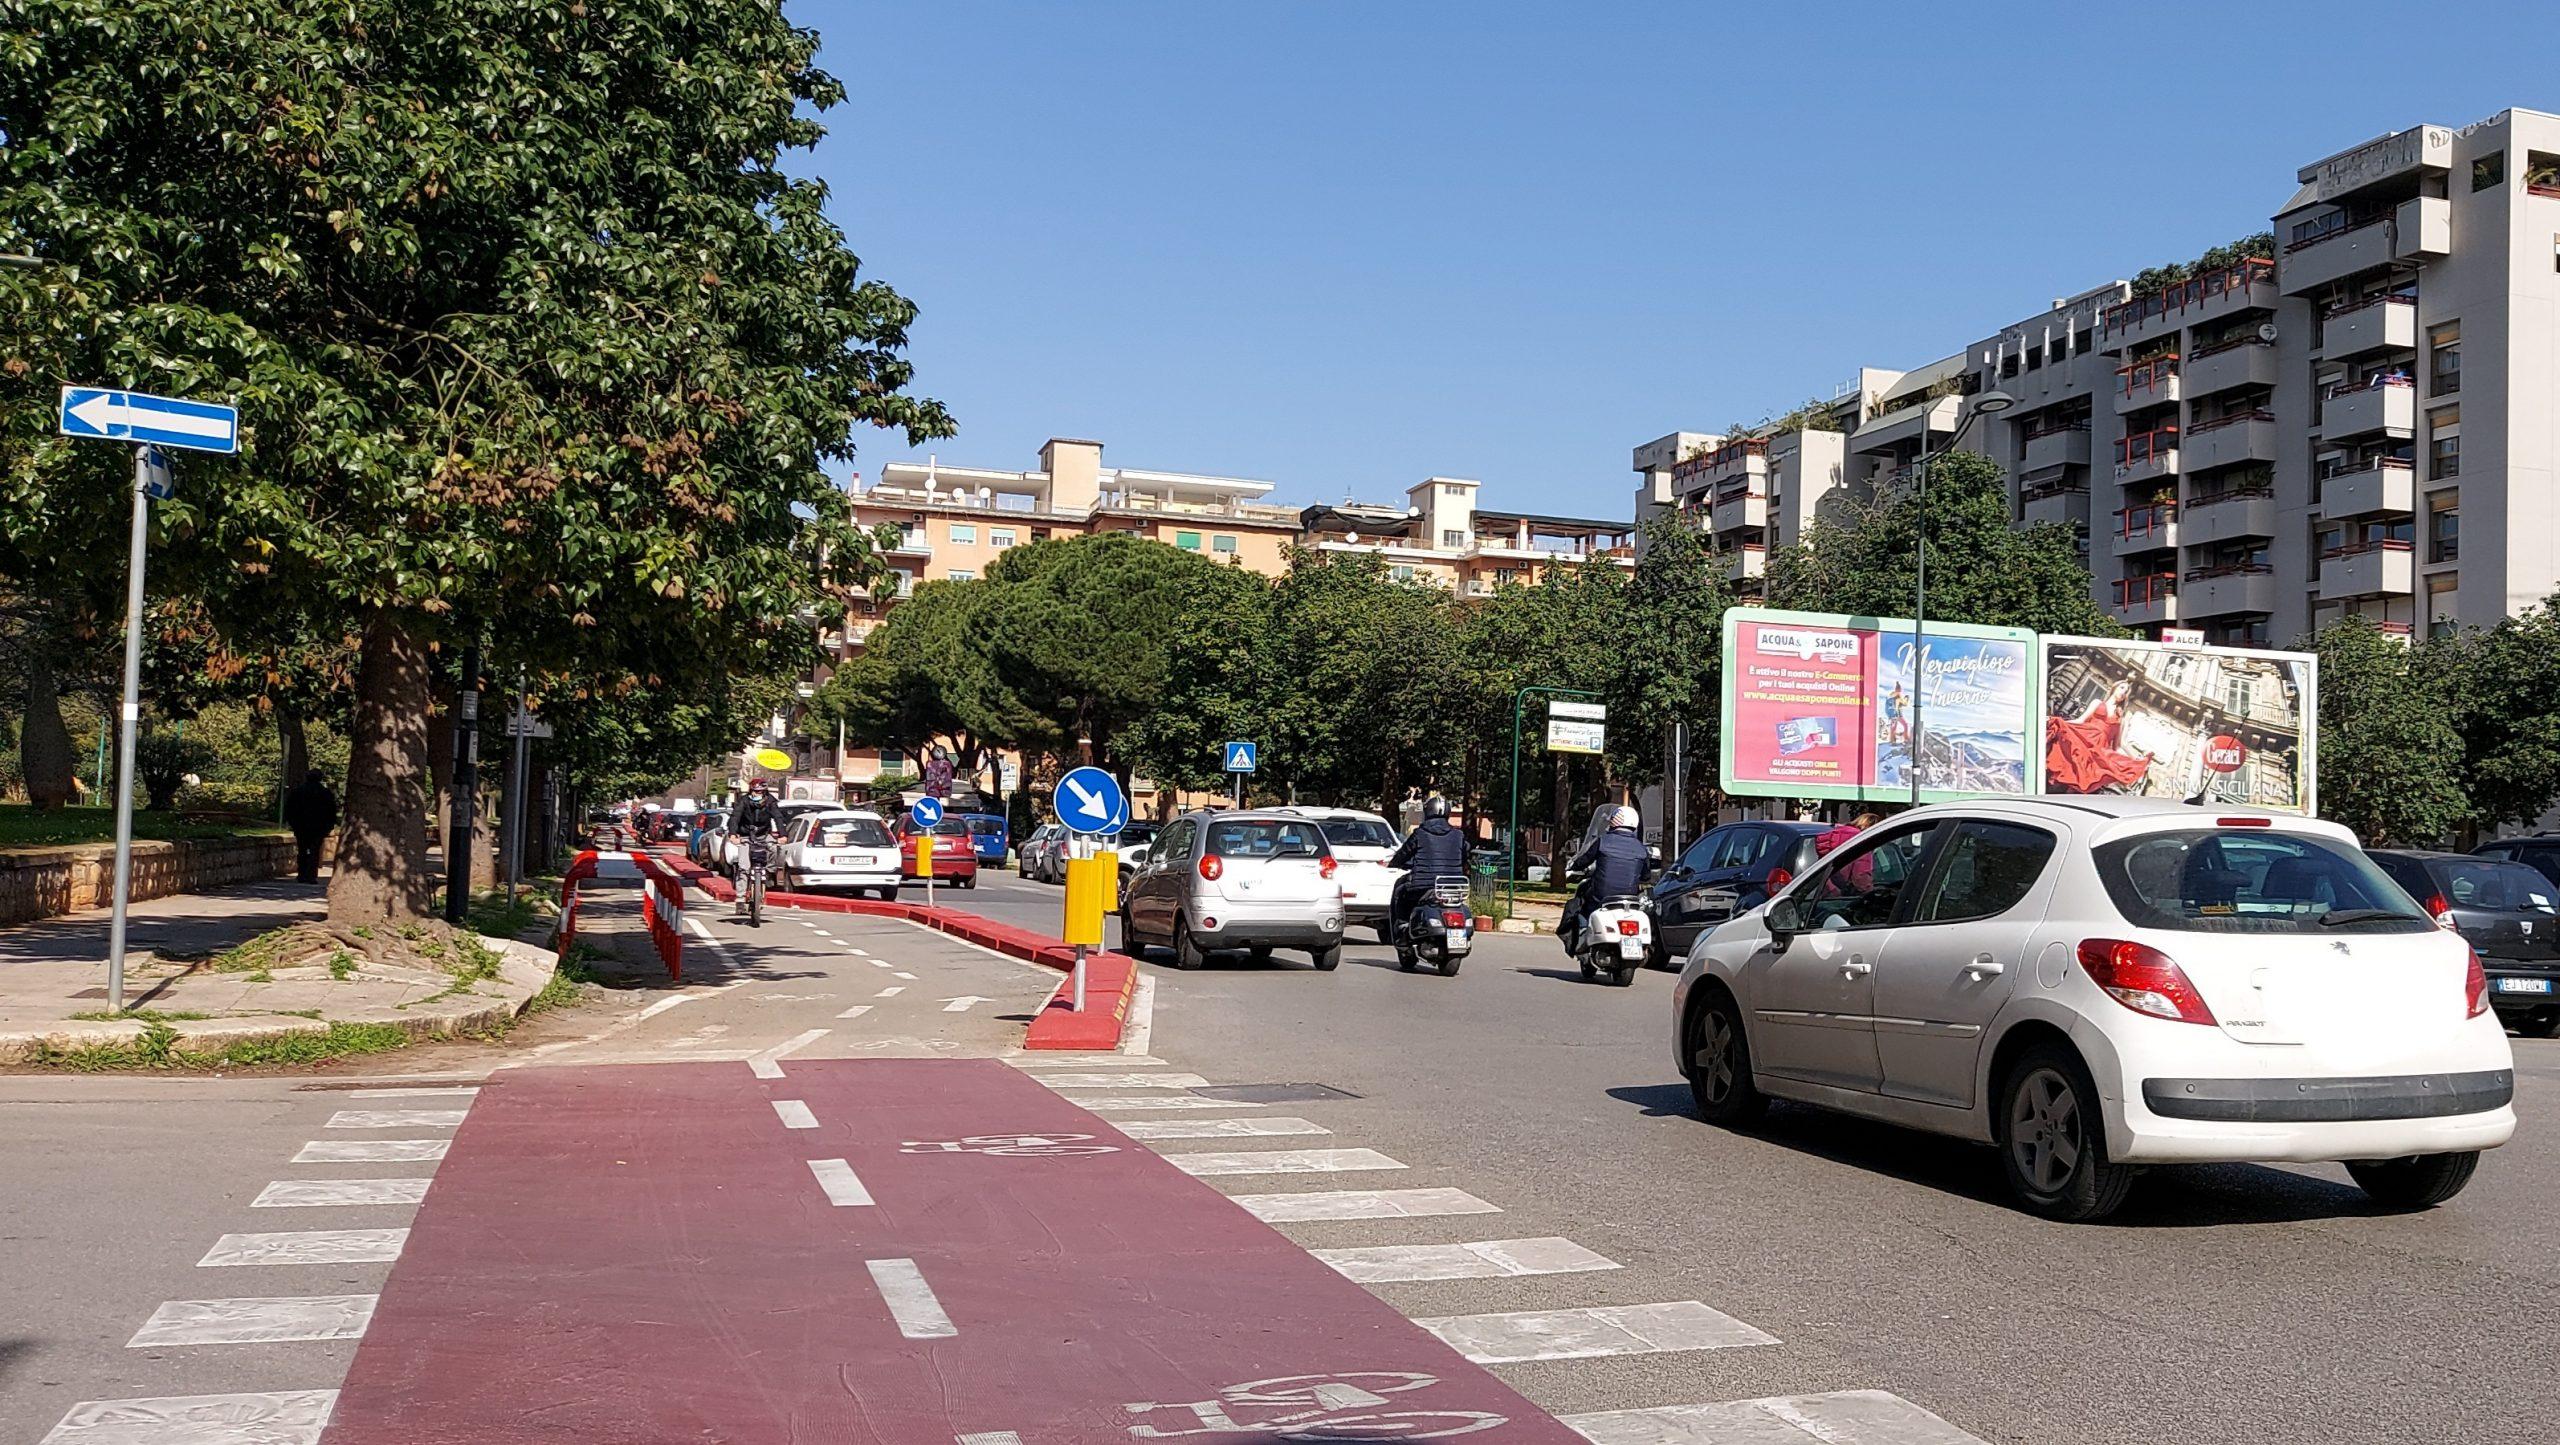 Pista ciclabile a Palermo